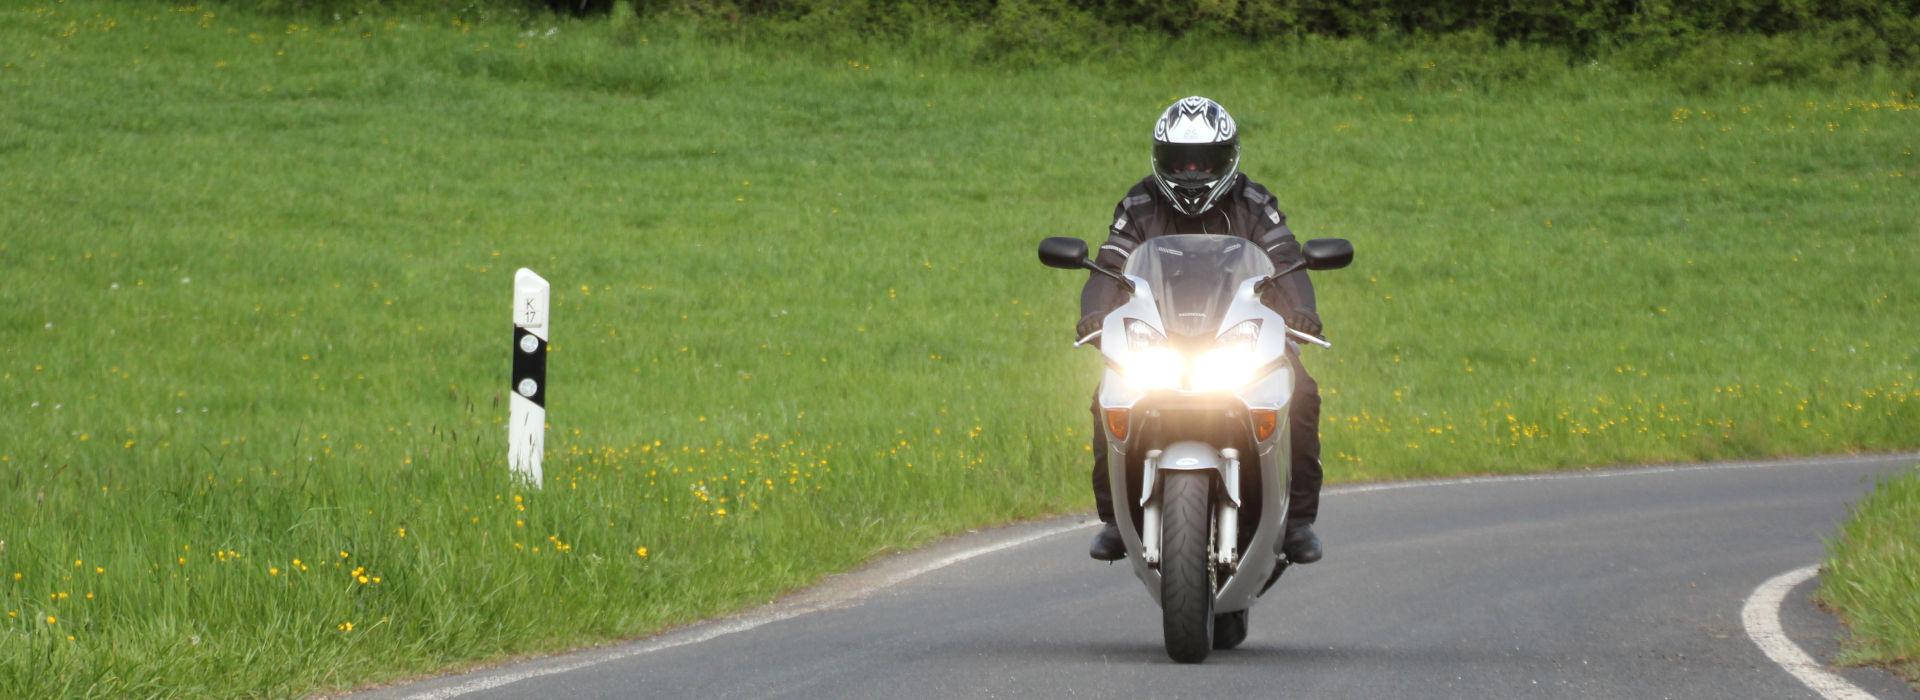 Motorrijbewijspoint Zwolle motorexamens AVB en AVD